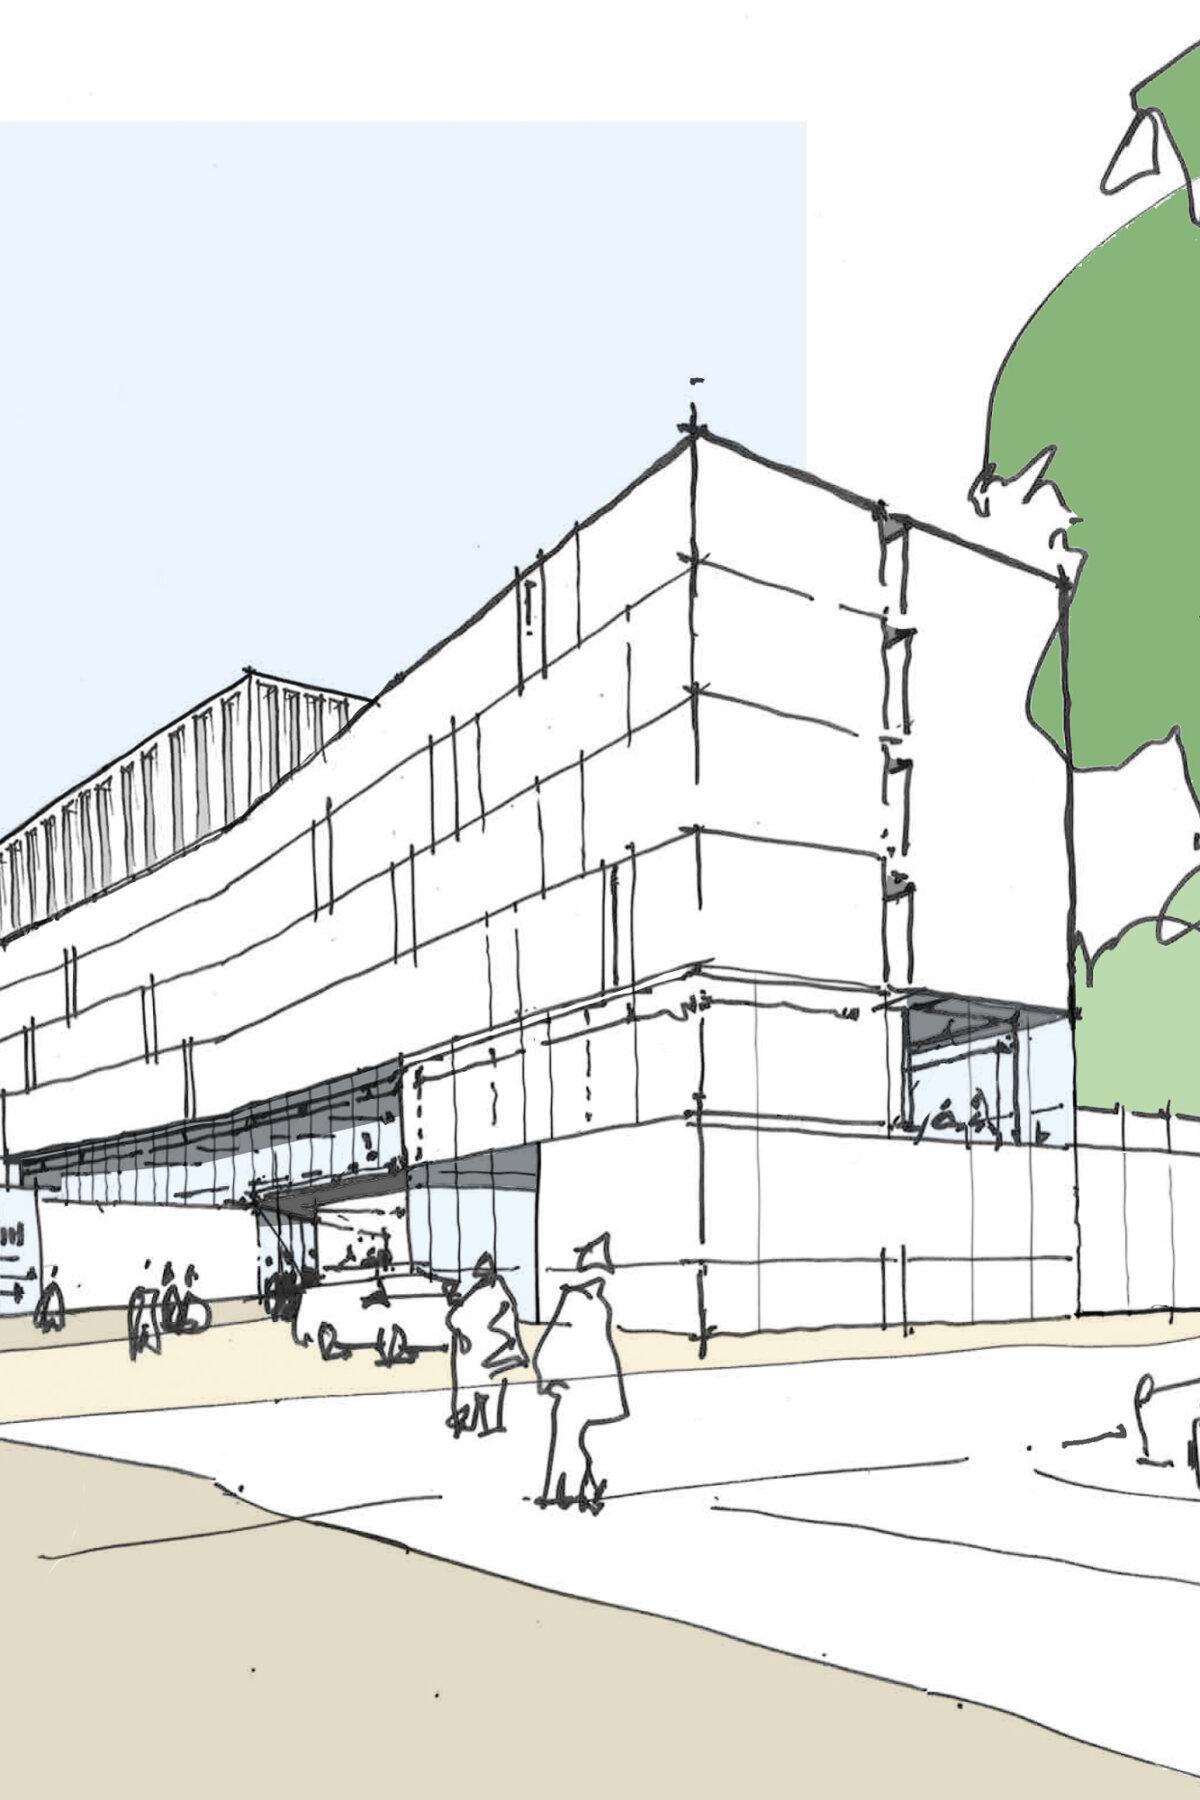 Sketch of the Clydebridge development